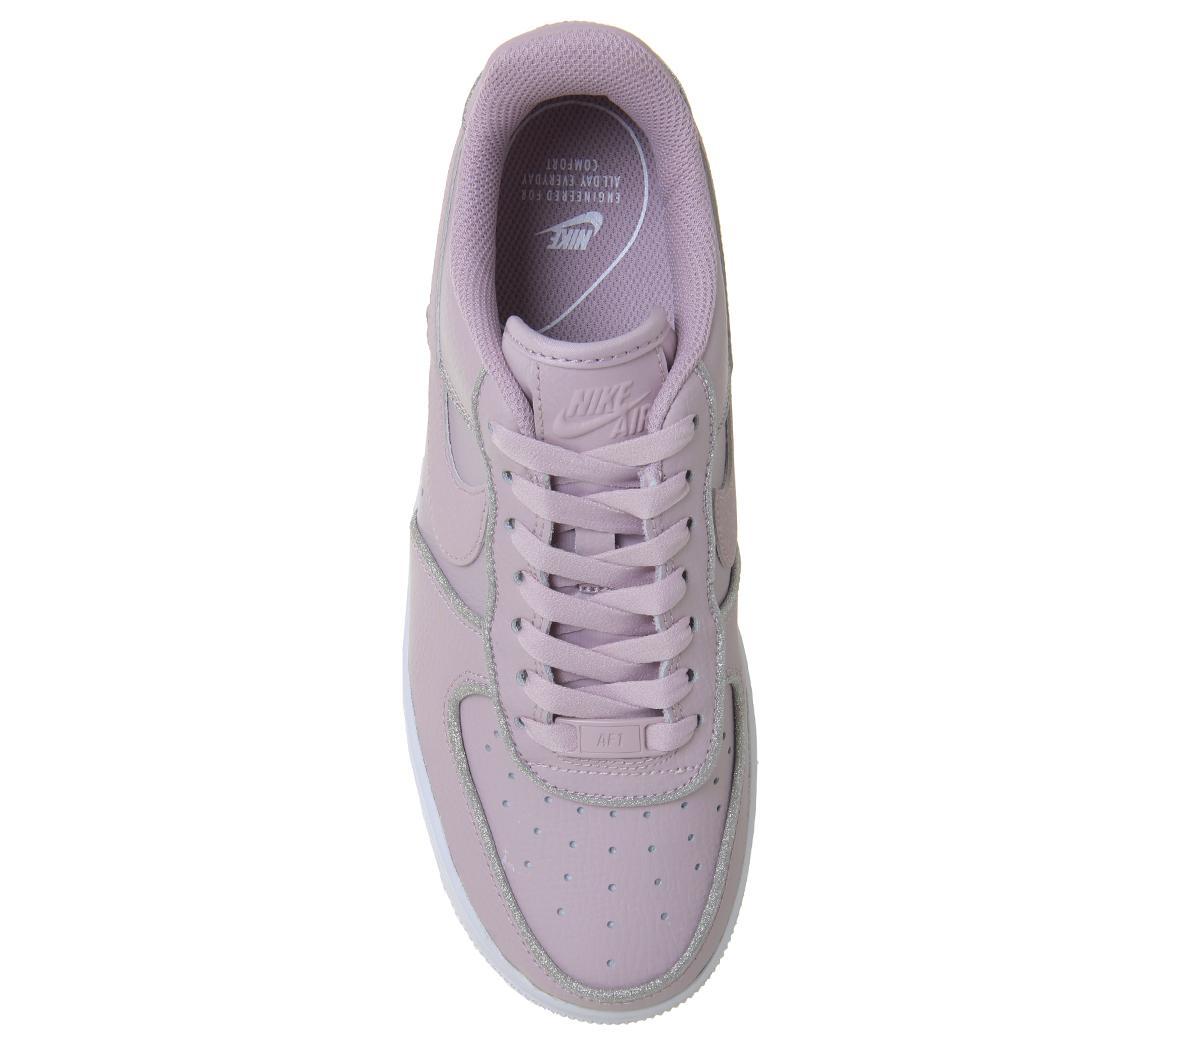 Nike Air Force 1 Größe 47.5 | low ✓ midi ✓ high ✓ dein